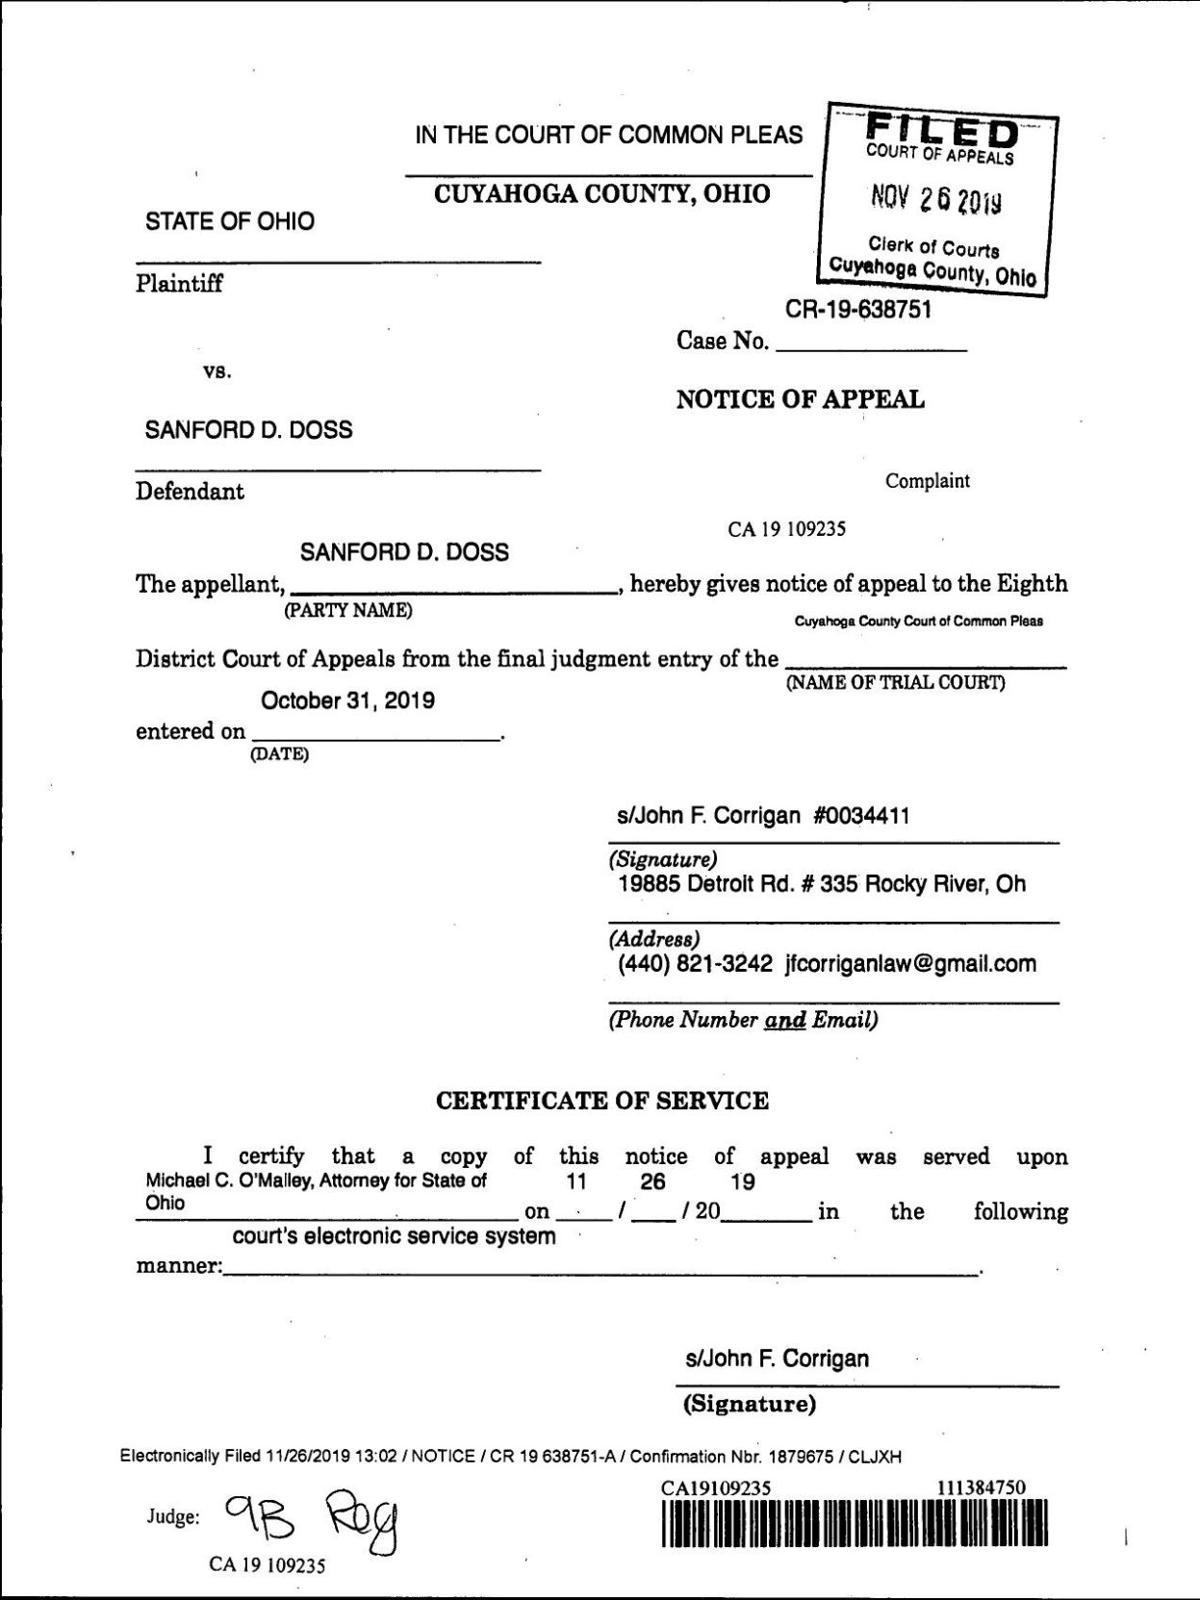 Sanford Doss appeal